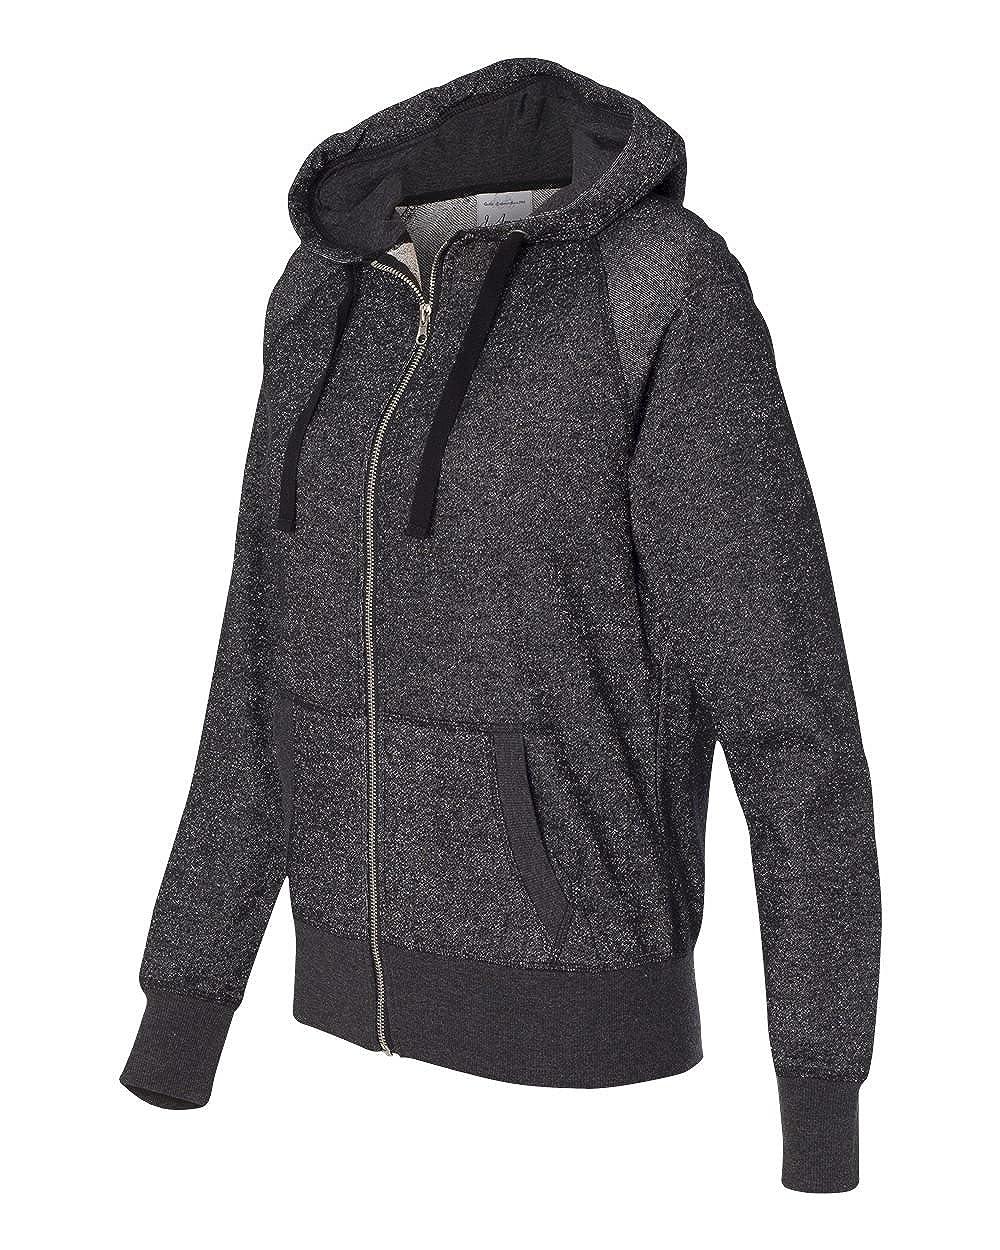 JA8868 J America Womens Glitter French Terry Contrast Full-Zip Hooded Fleece